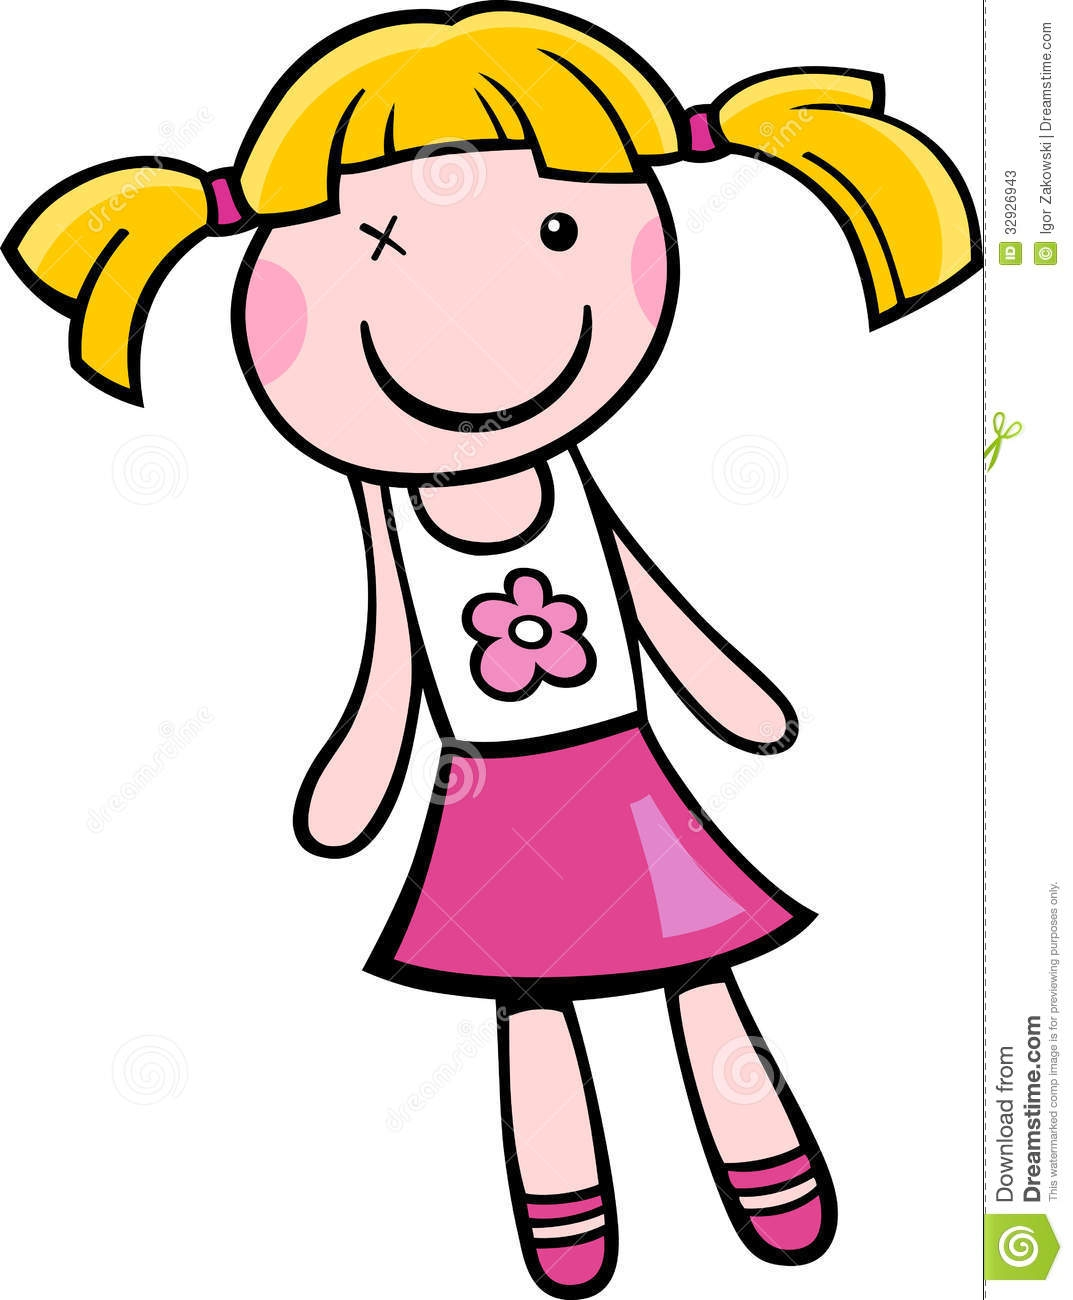 1073x1300 Clip Art Barbie Doll Clipart Black And White Tqvmcgm